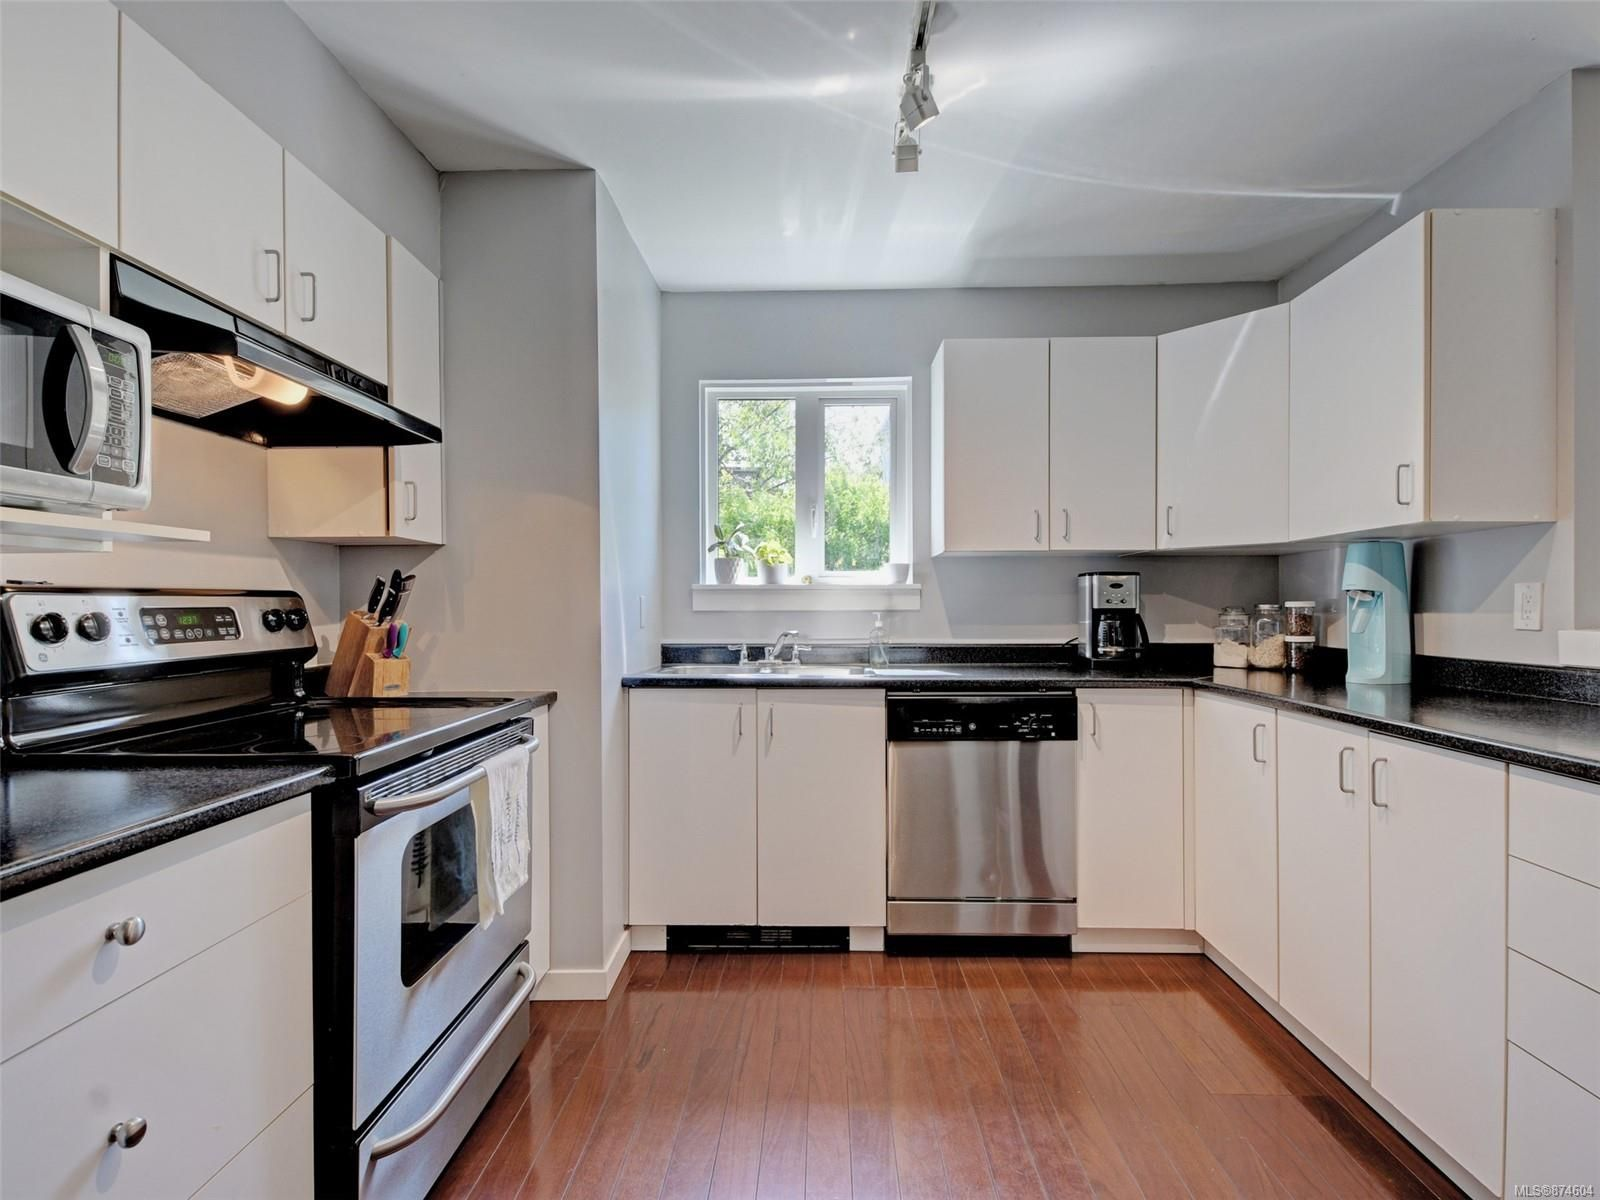 Photo 7: Photos: 202 2710 Grosvenor Rd in : Vi Oaklands Condo for sale (Victoria)  : MLS®# 874604